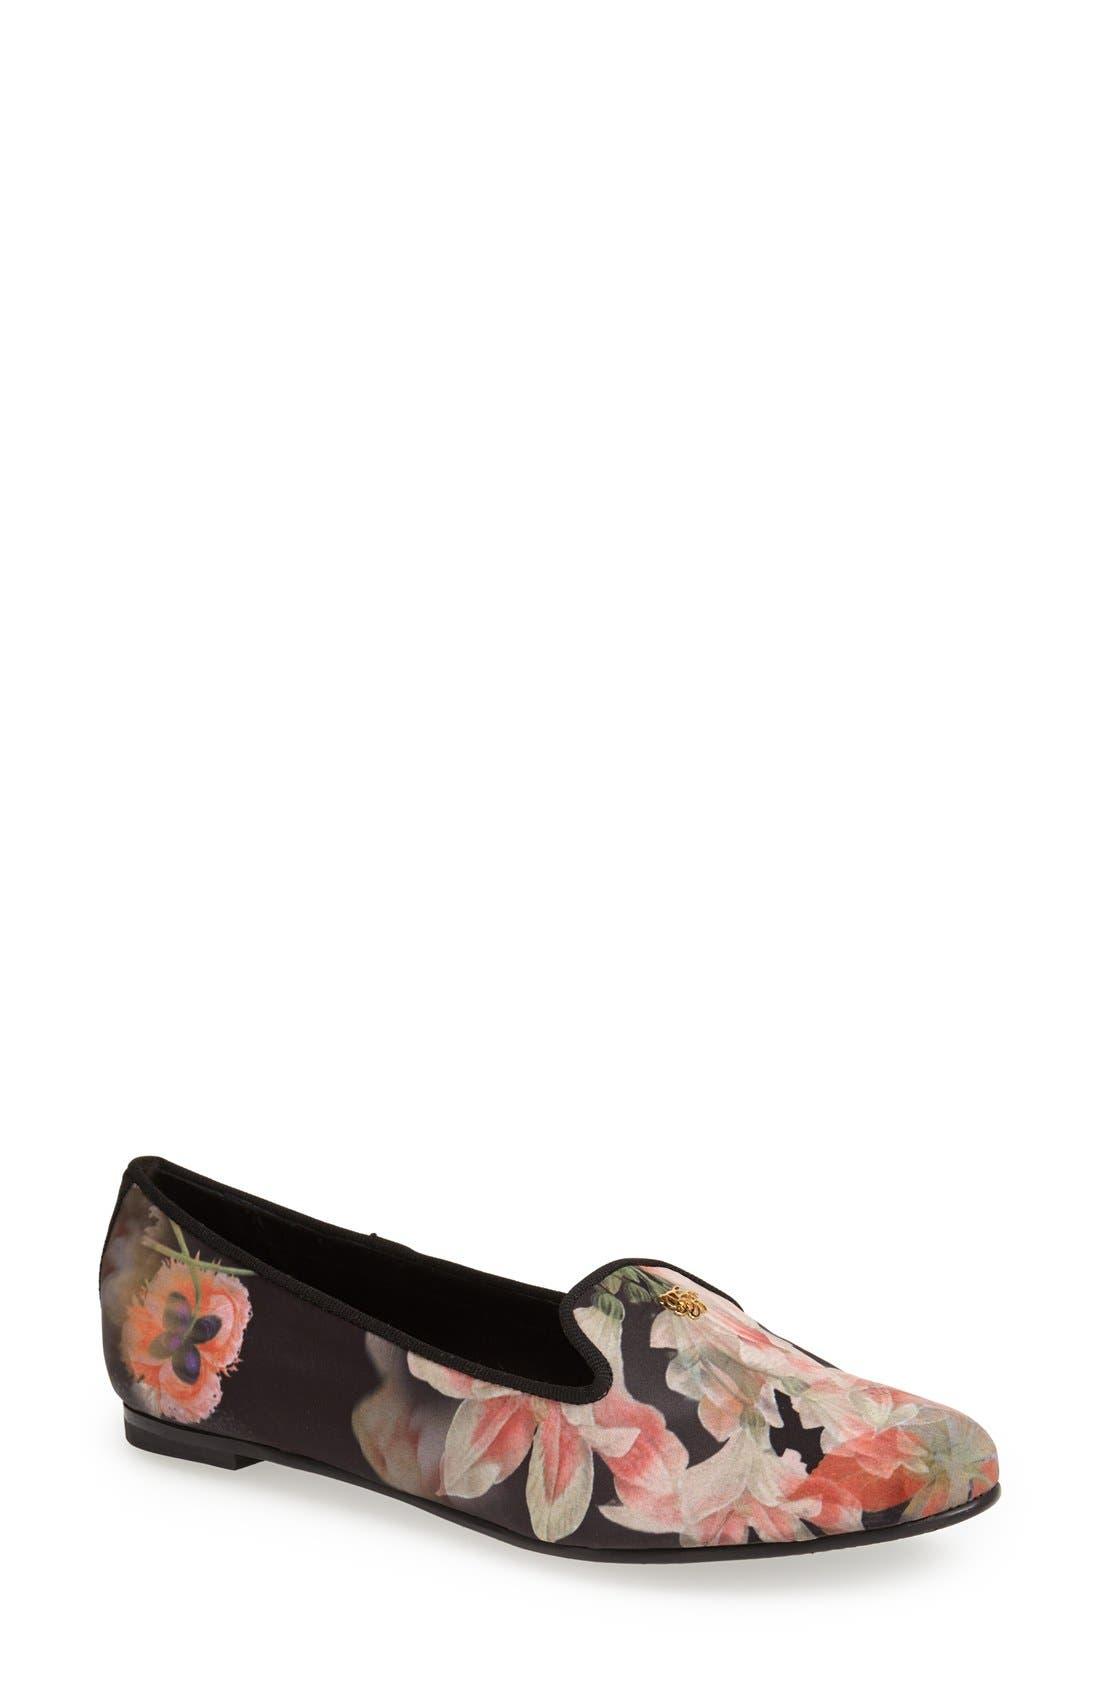 Alternate Image 1 Selected - Ted Baker London 'Jaday' Loafer (Women)